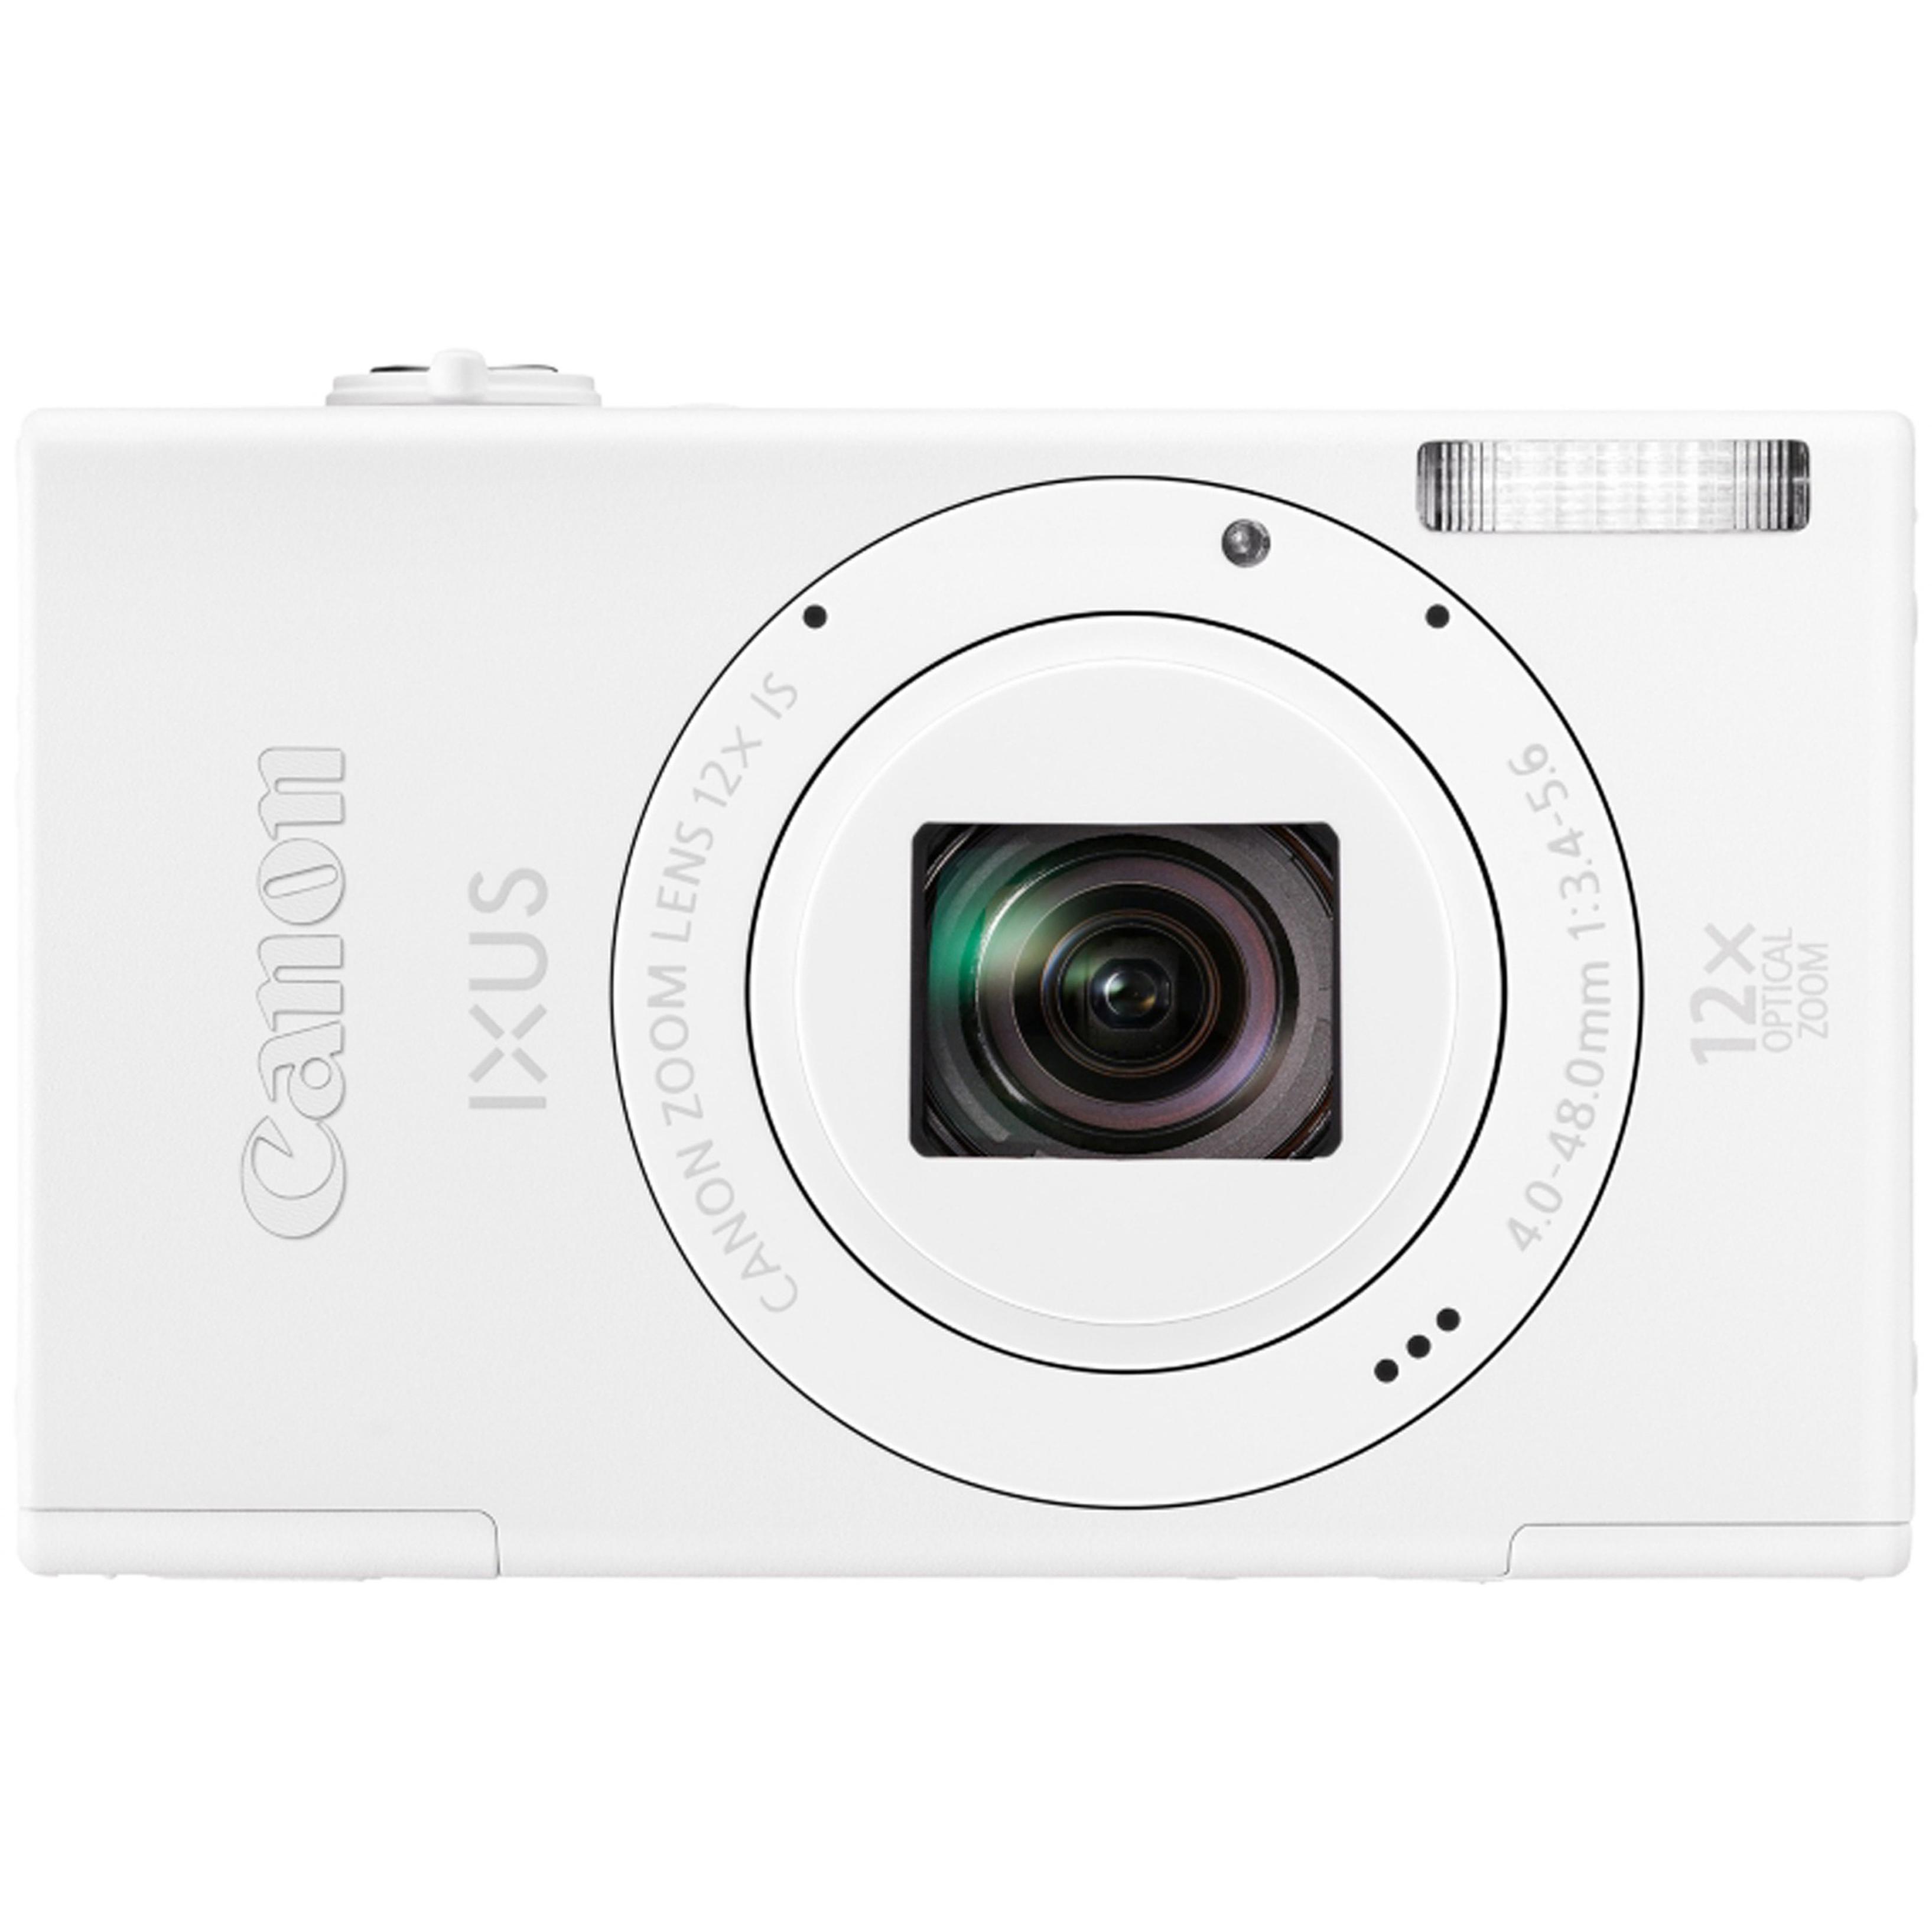 Canon IXUS 510 HS Camera, White